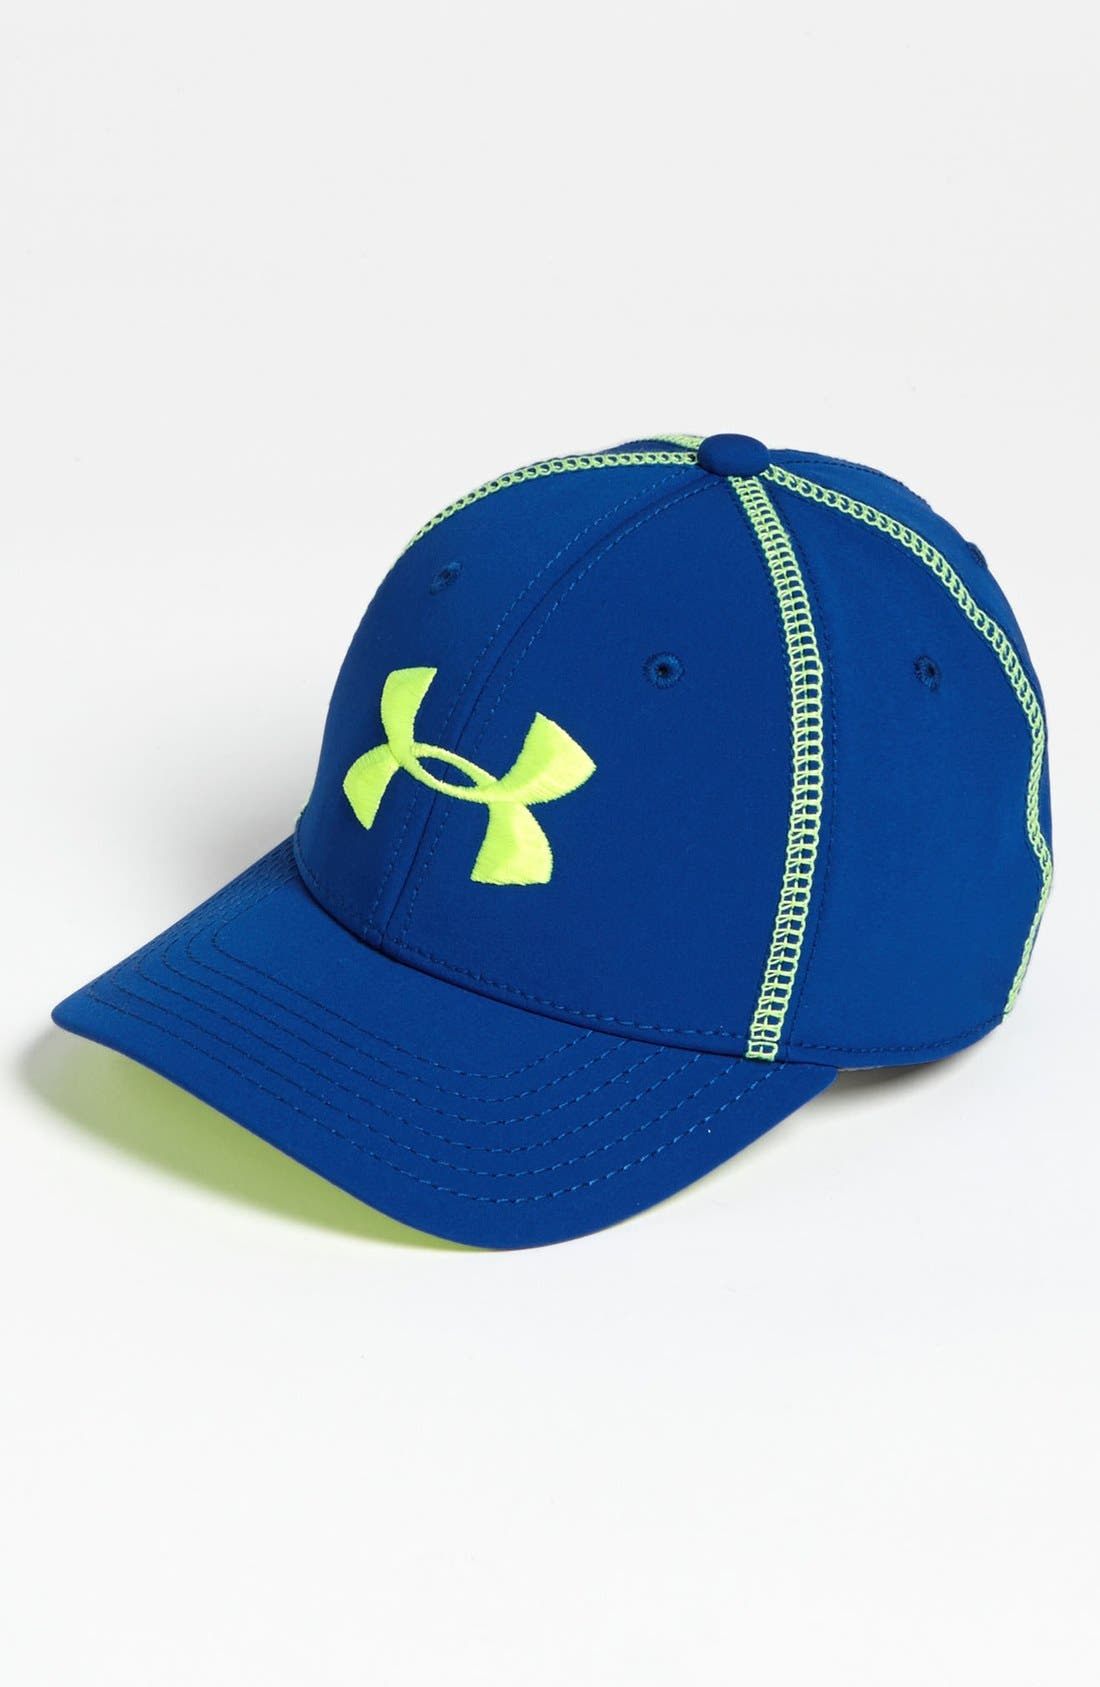 Main Image - Under Armour 'Catalyst' Hat (Boys)